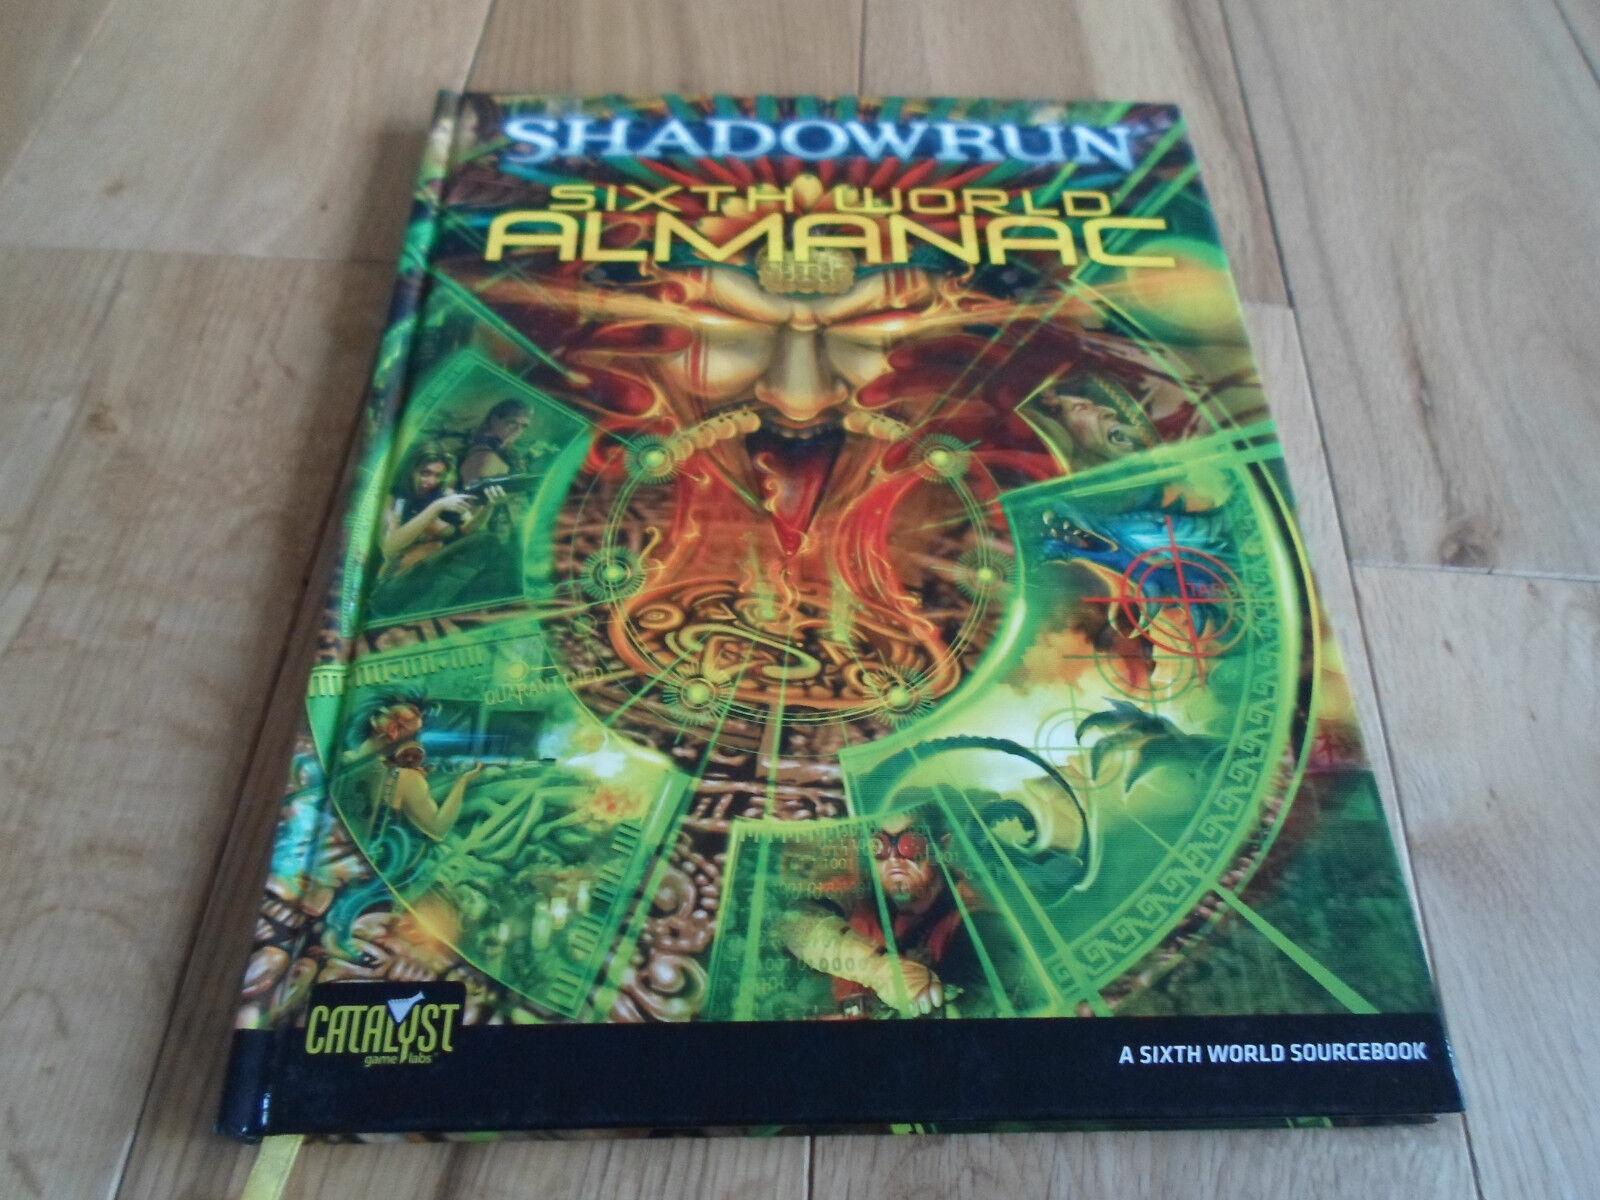 RARE Shadowrun Roleplaying Game  Sixth Sixth Sixth World Almanac (MINT NEW) 6e7616